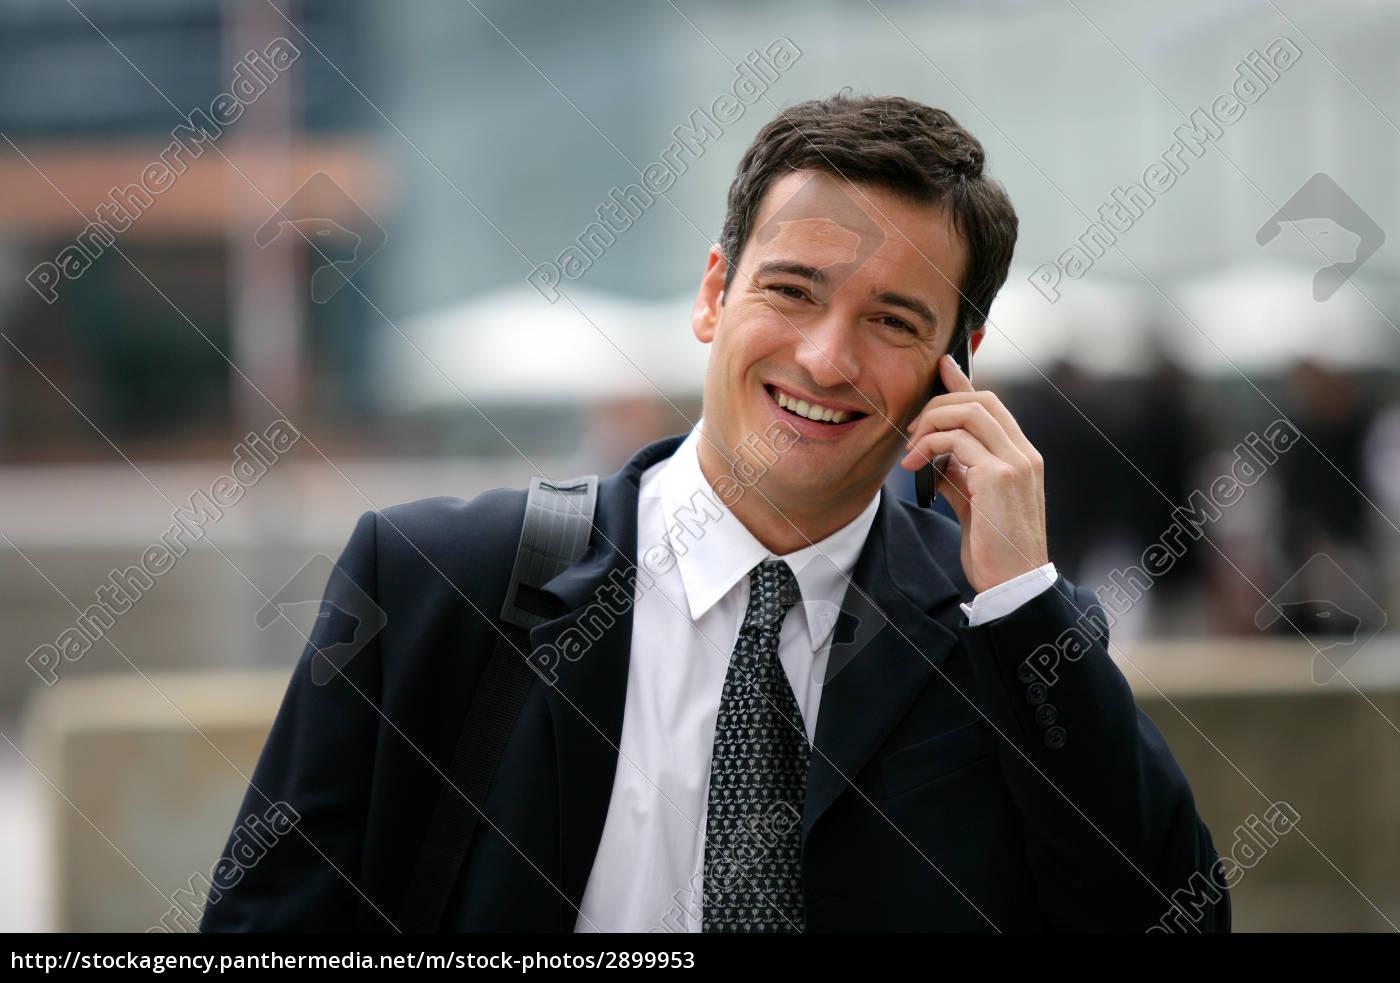 portrait, of, smiling, men, in, suits - 2899953